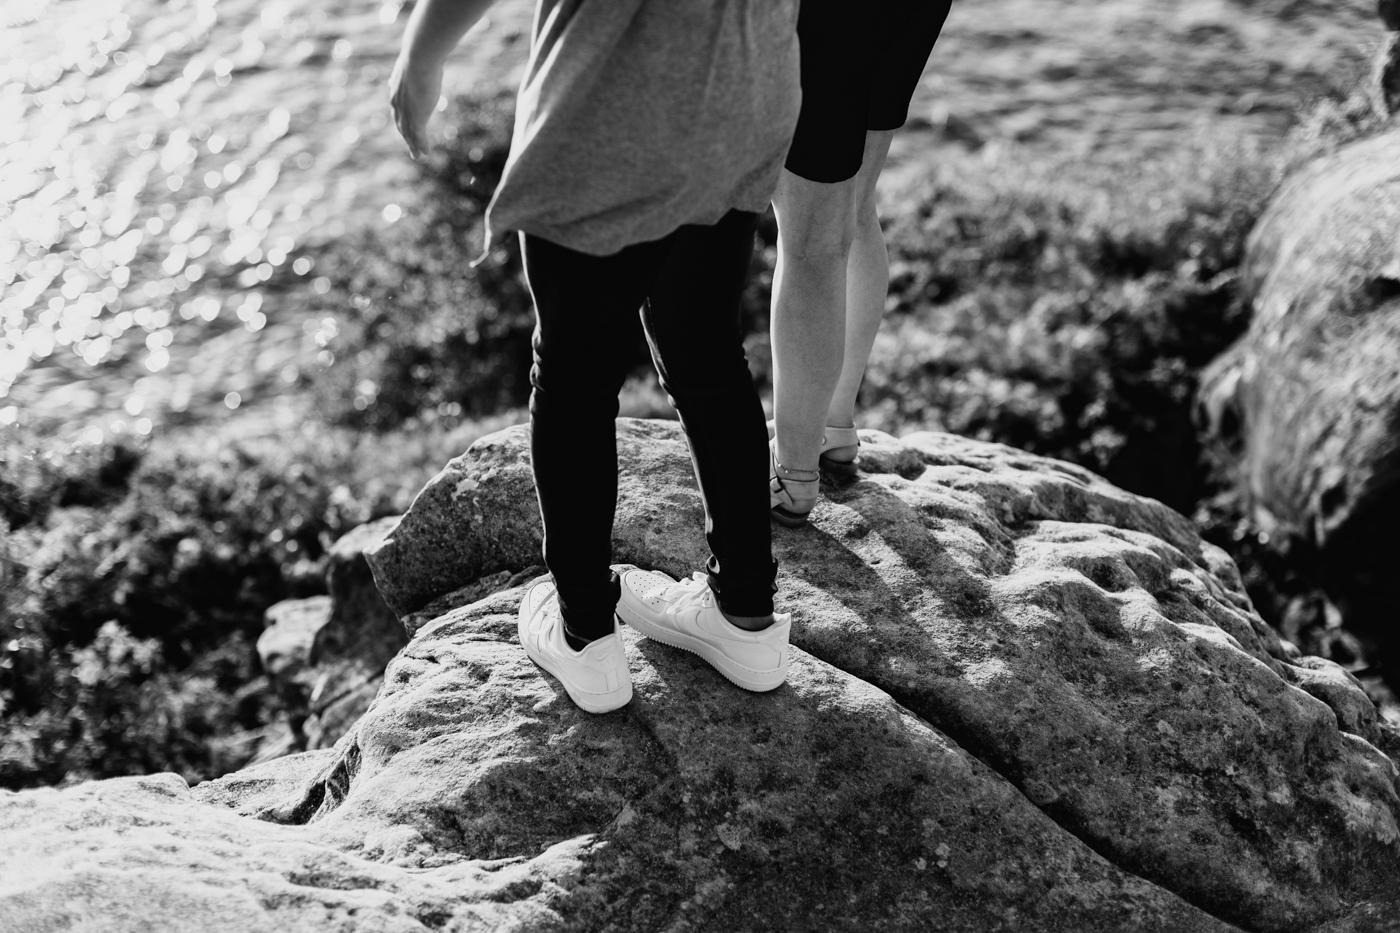 James & Caitie Engagement - Watsons Bay - Samantha Heather Photography-35.jpg